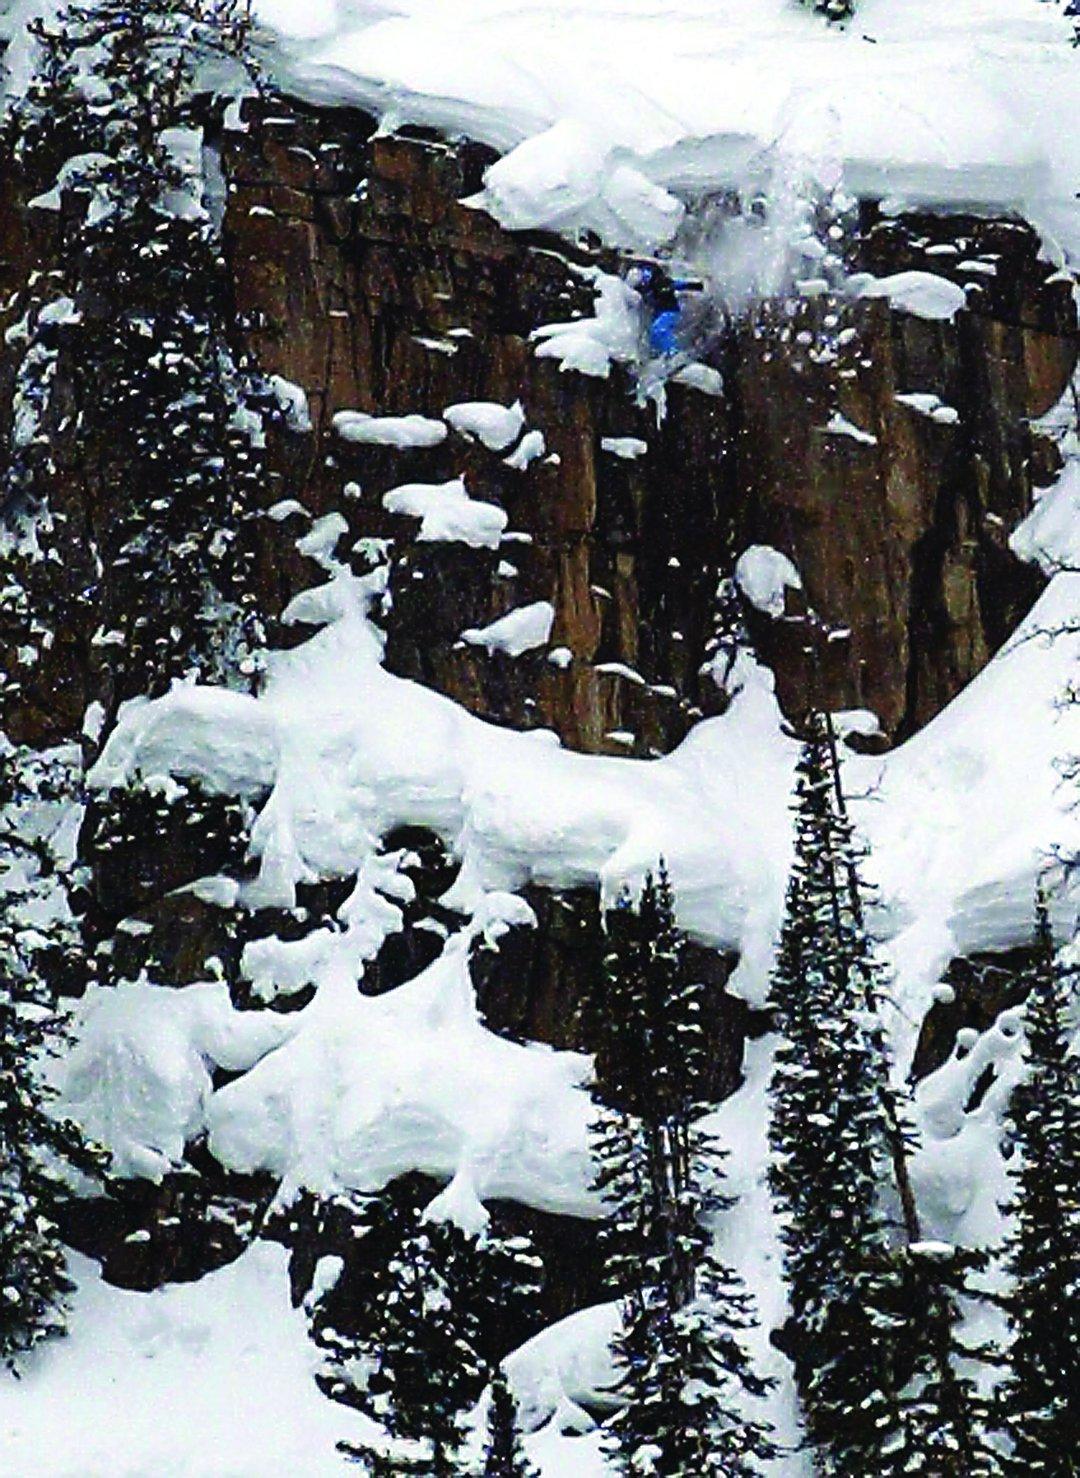 Triple Drop at Snowmass